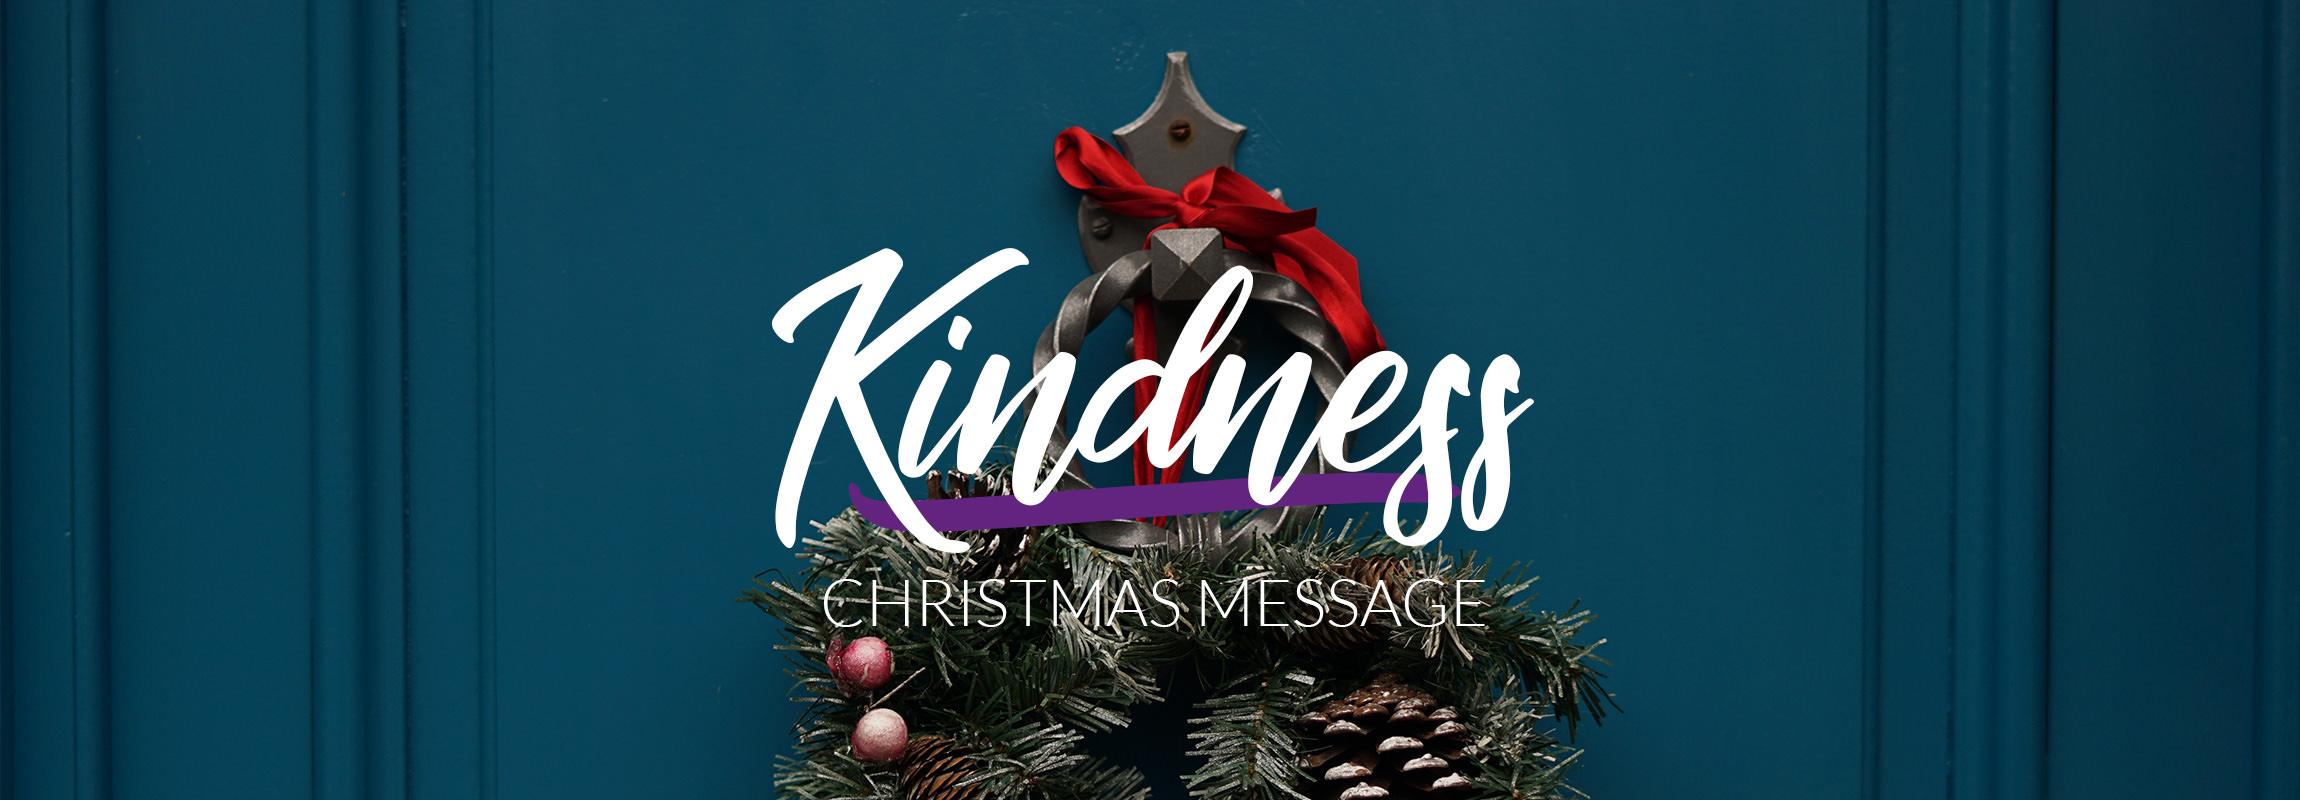 Christmas Message: Kindness - Eve